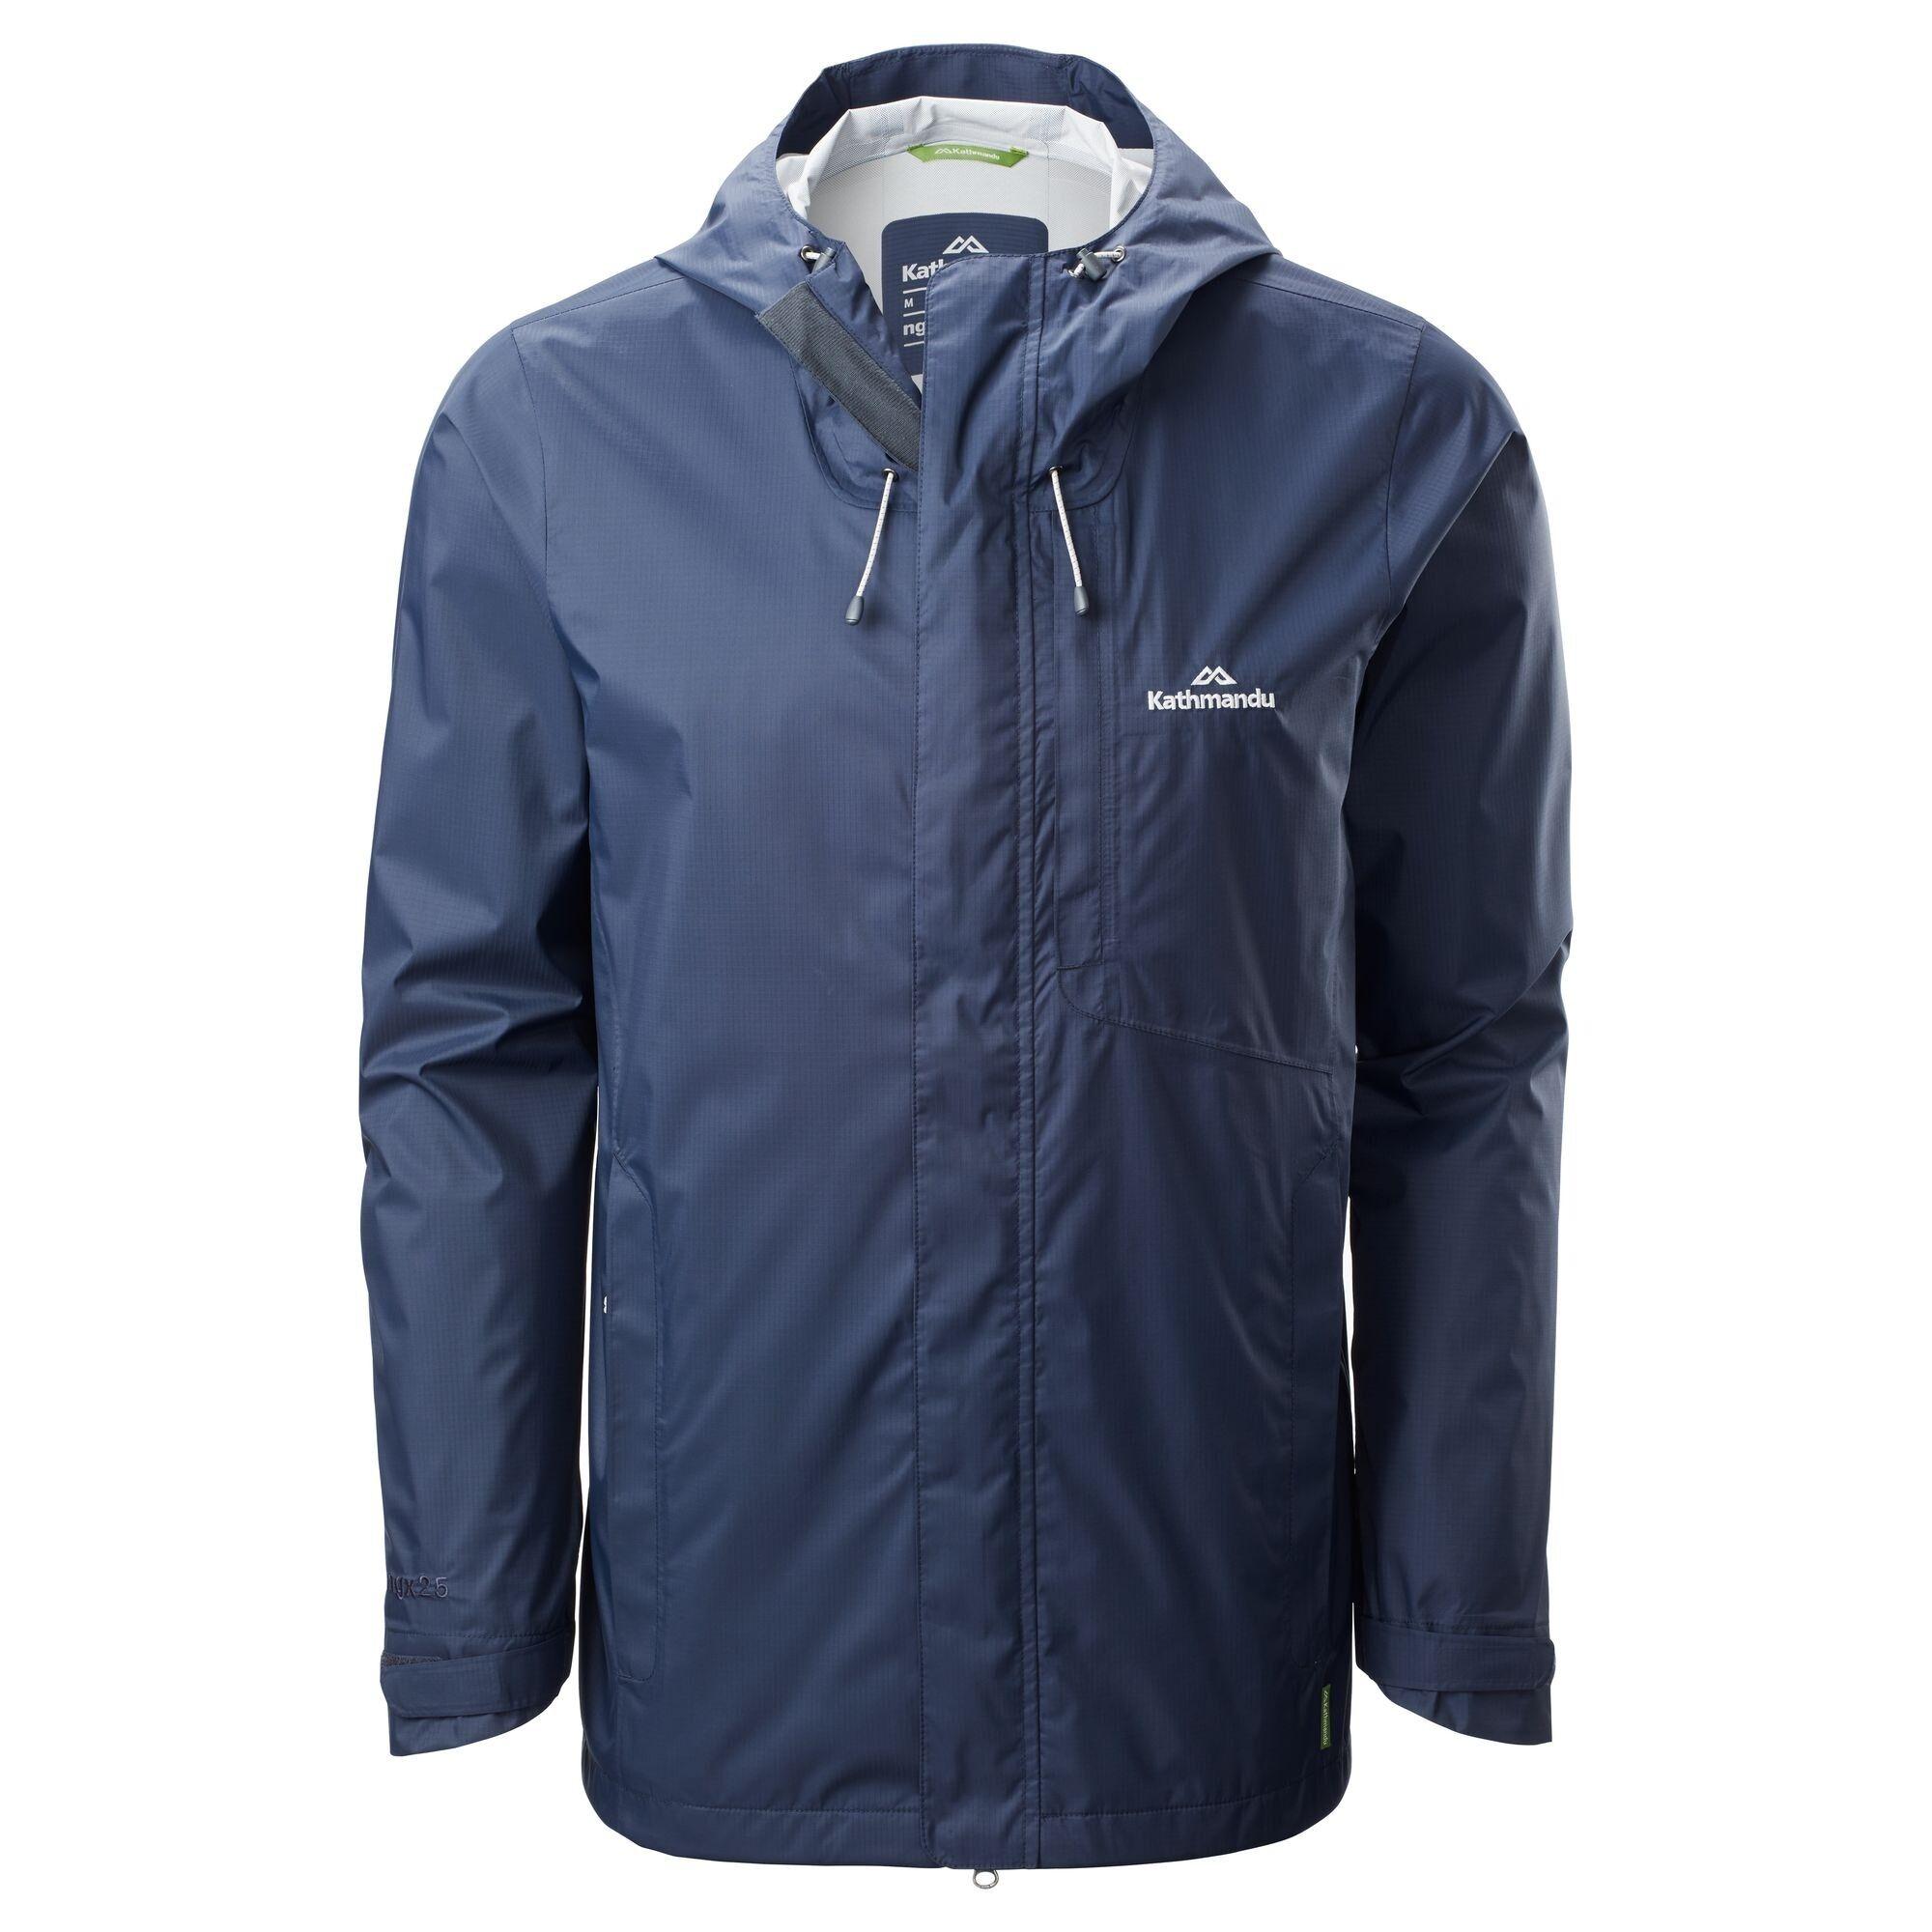 Kathmandu Trailhead Men's Rain Jacket  - Midnight Navy - Size: Medium